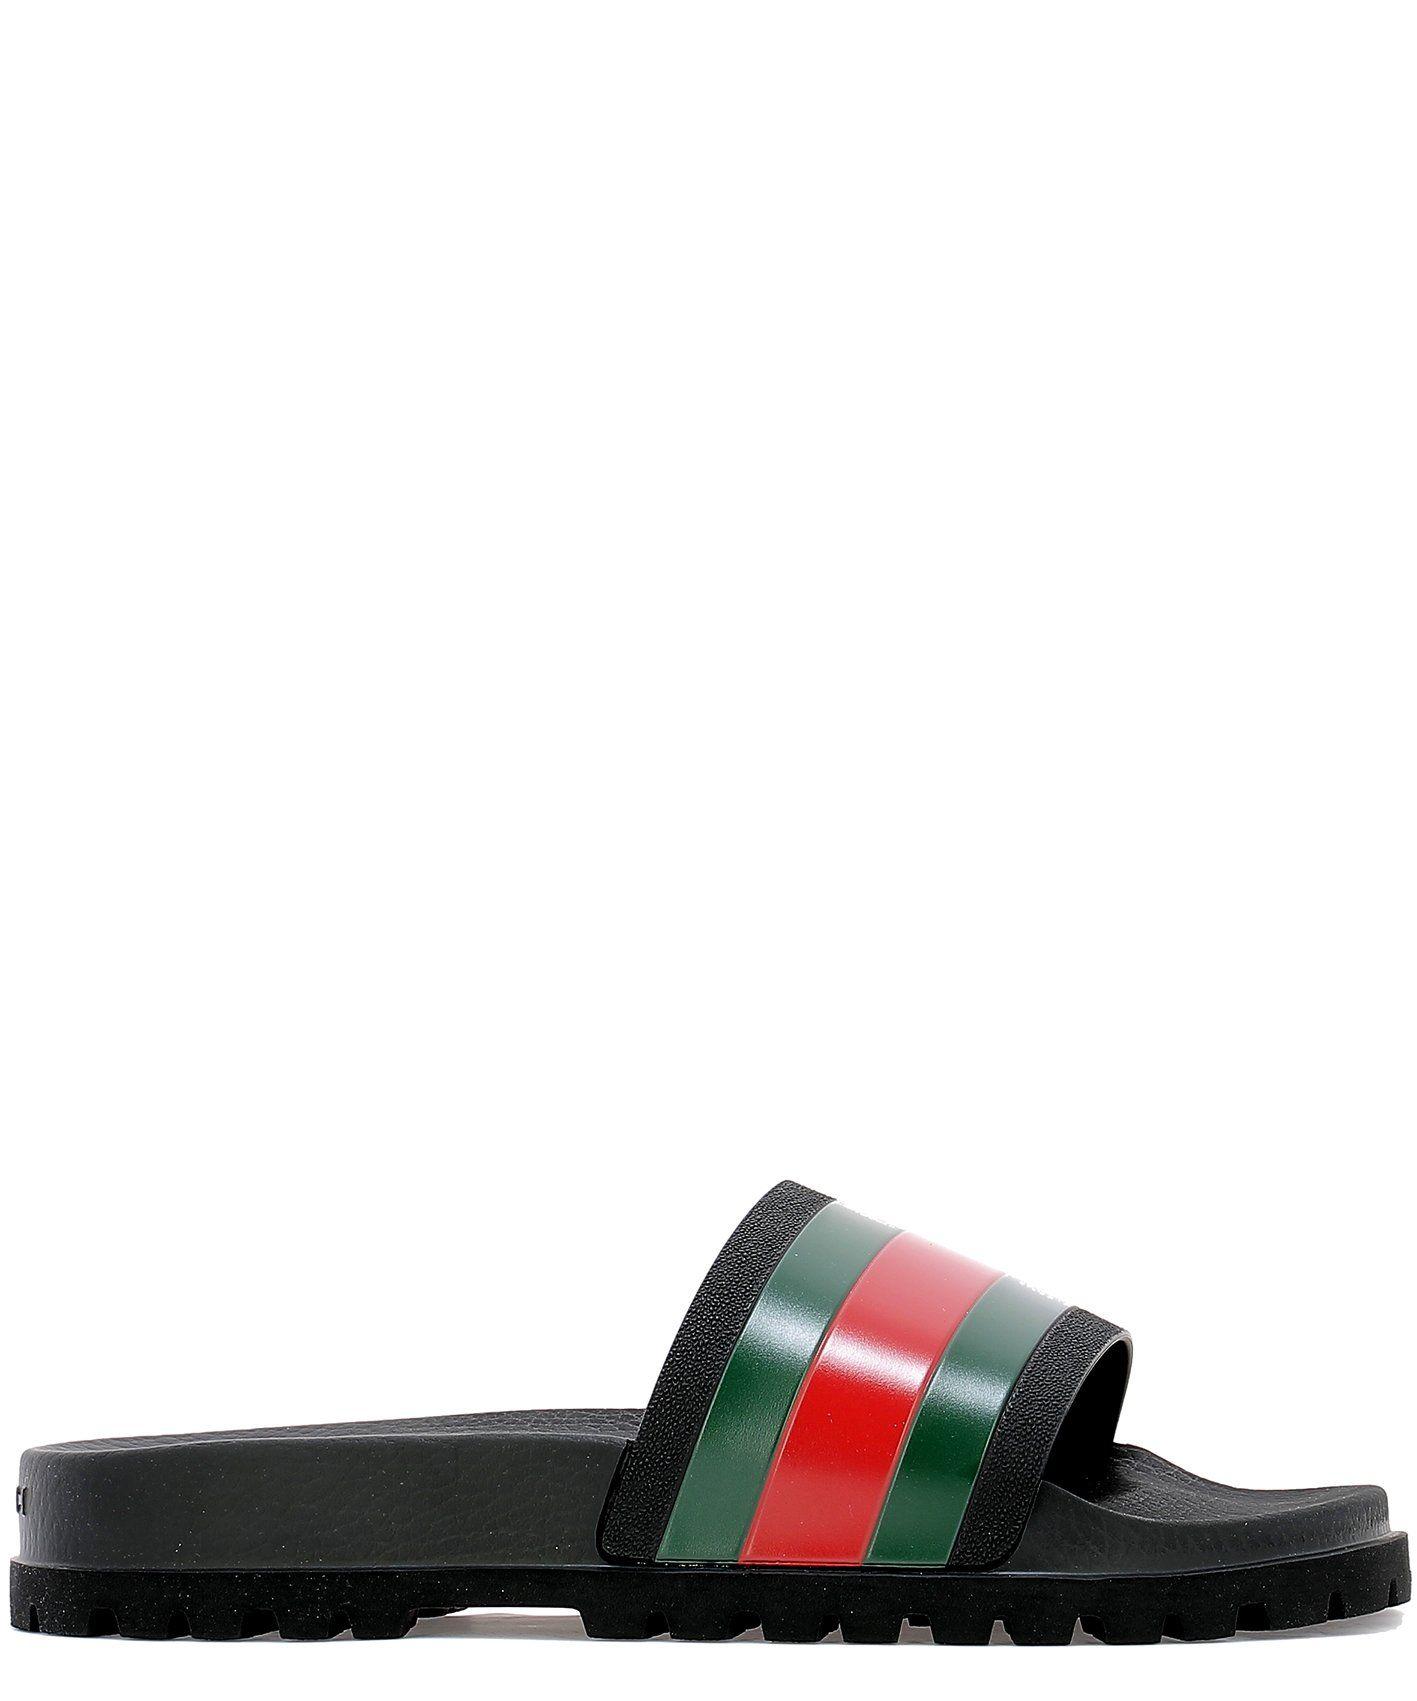 4f174714bc3 GUCCI GUCCI WEB DETAIL RUBBER SLIDES.  gucci  shoes